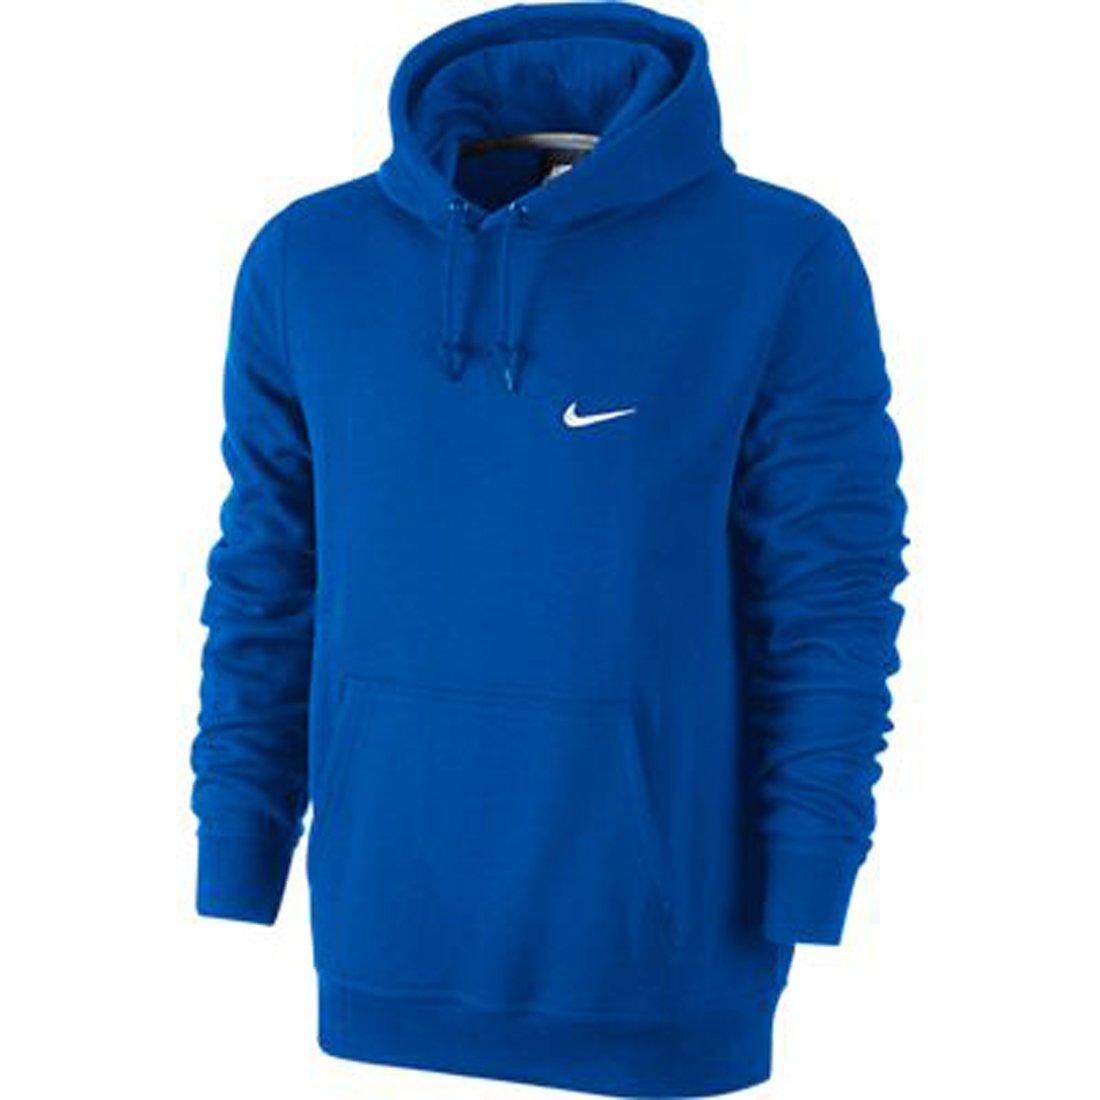 Nike PSG Y Nk Dry Sqd TRK Suit K Tracksuit, Unisex niños: Amazon.es: Deportes y aire libre